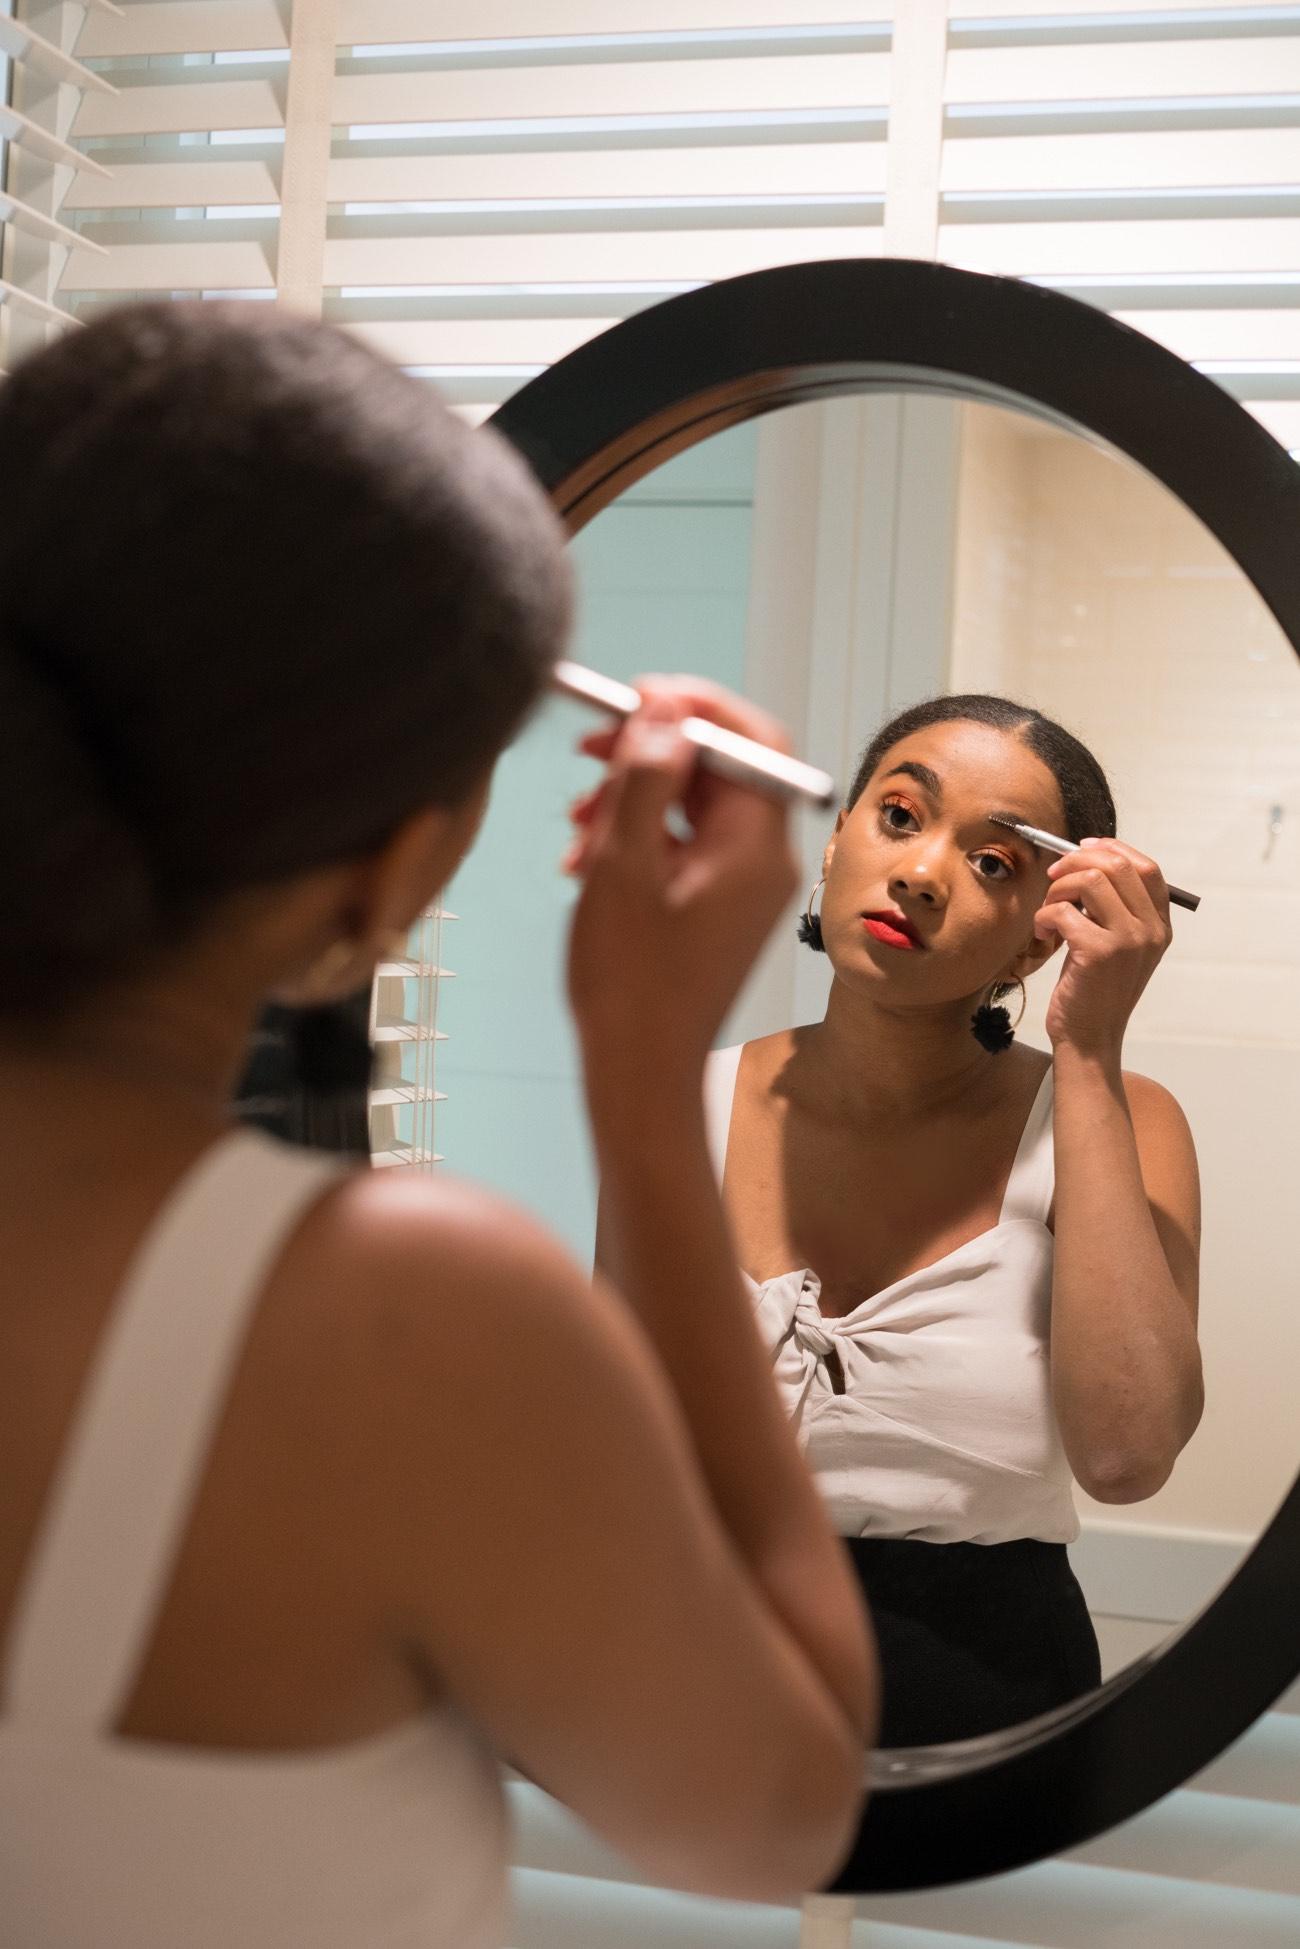 Herbstliches Makeup - Fall makeup